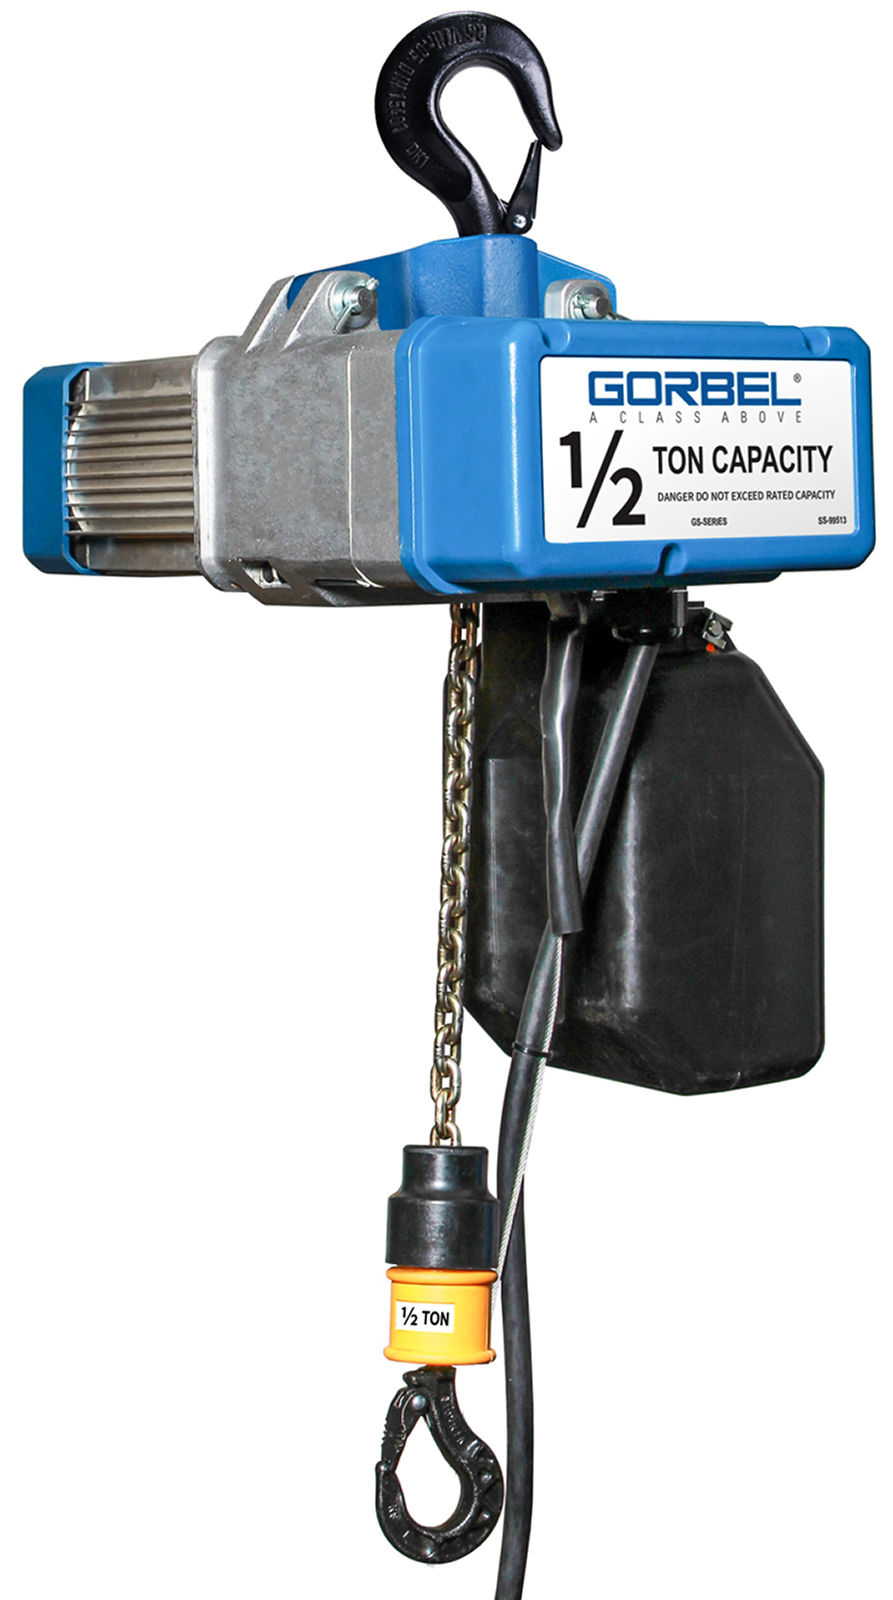 1/2-Ton Gorbel GS Electric Chain Hoist, GECH-1/2, 1 Chain Fall